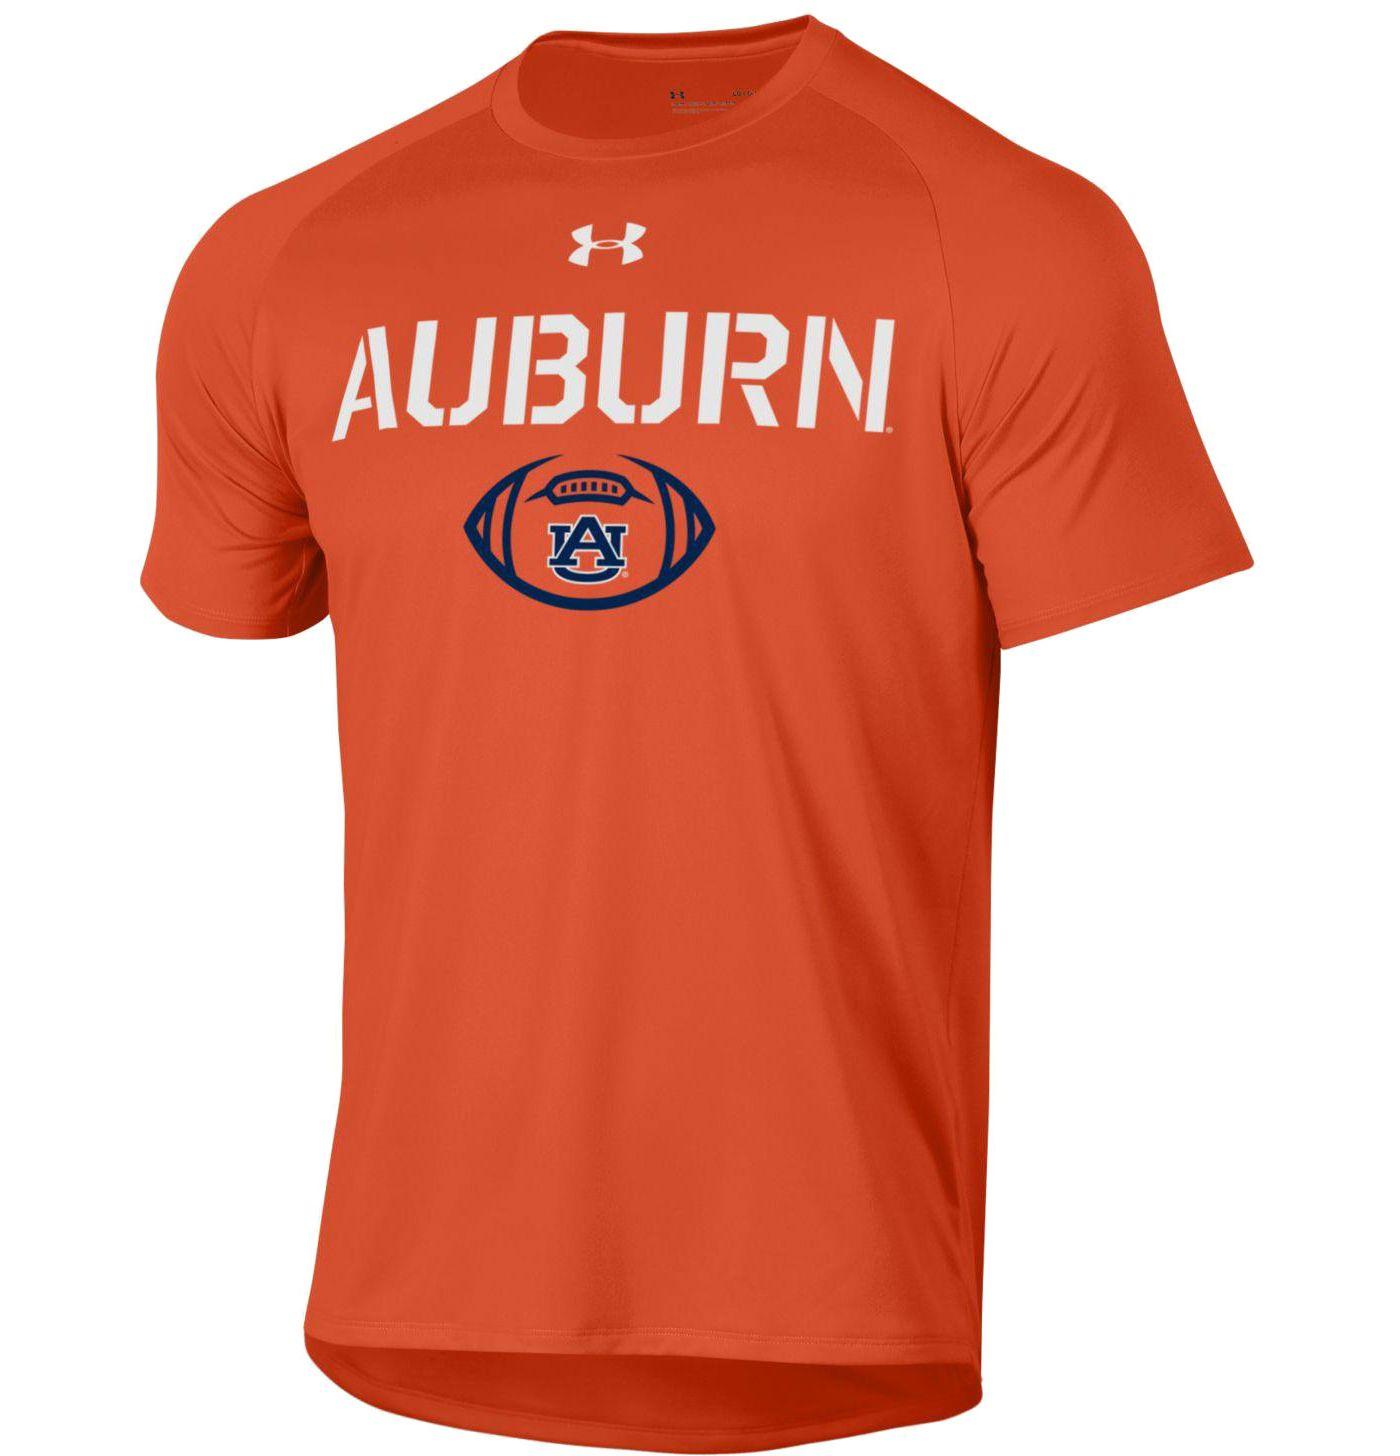 Under Armour Men's Auburn Tigers Orange Football Tech Performance T-Shirt